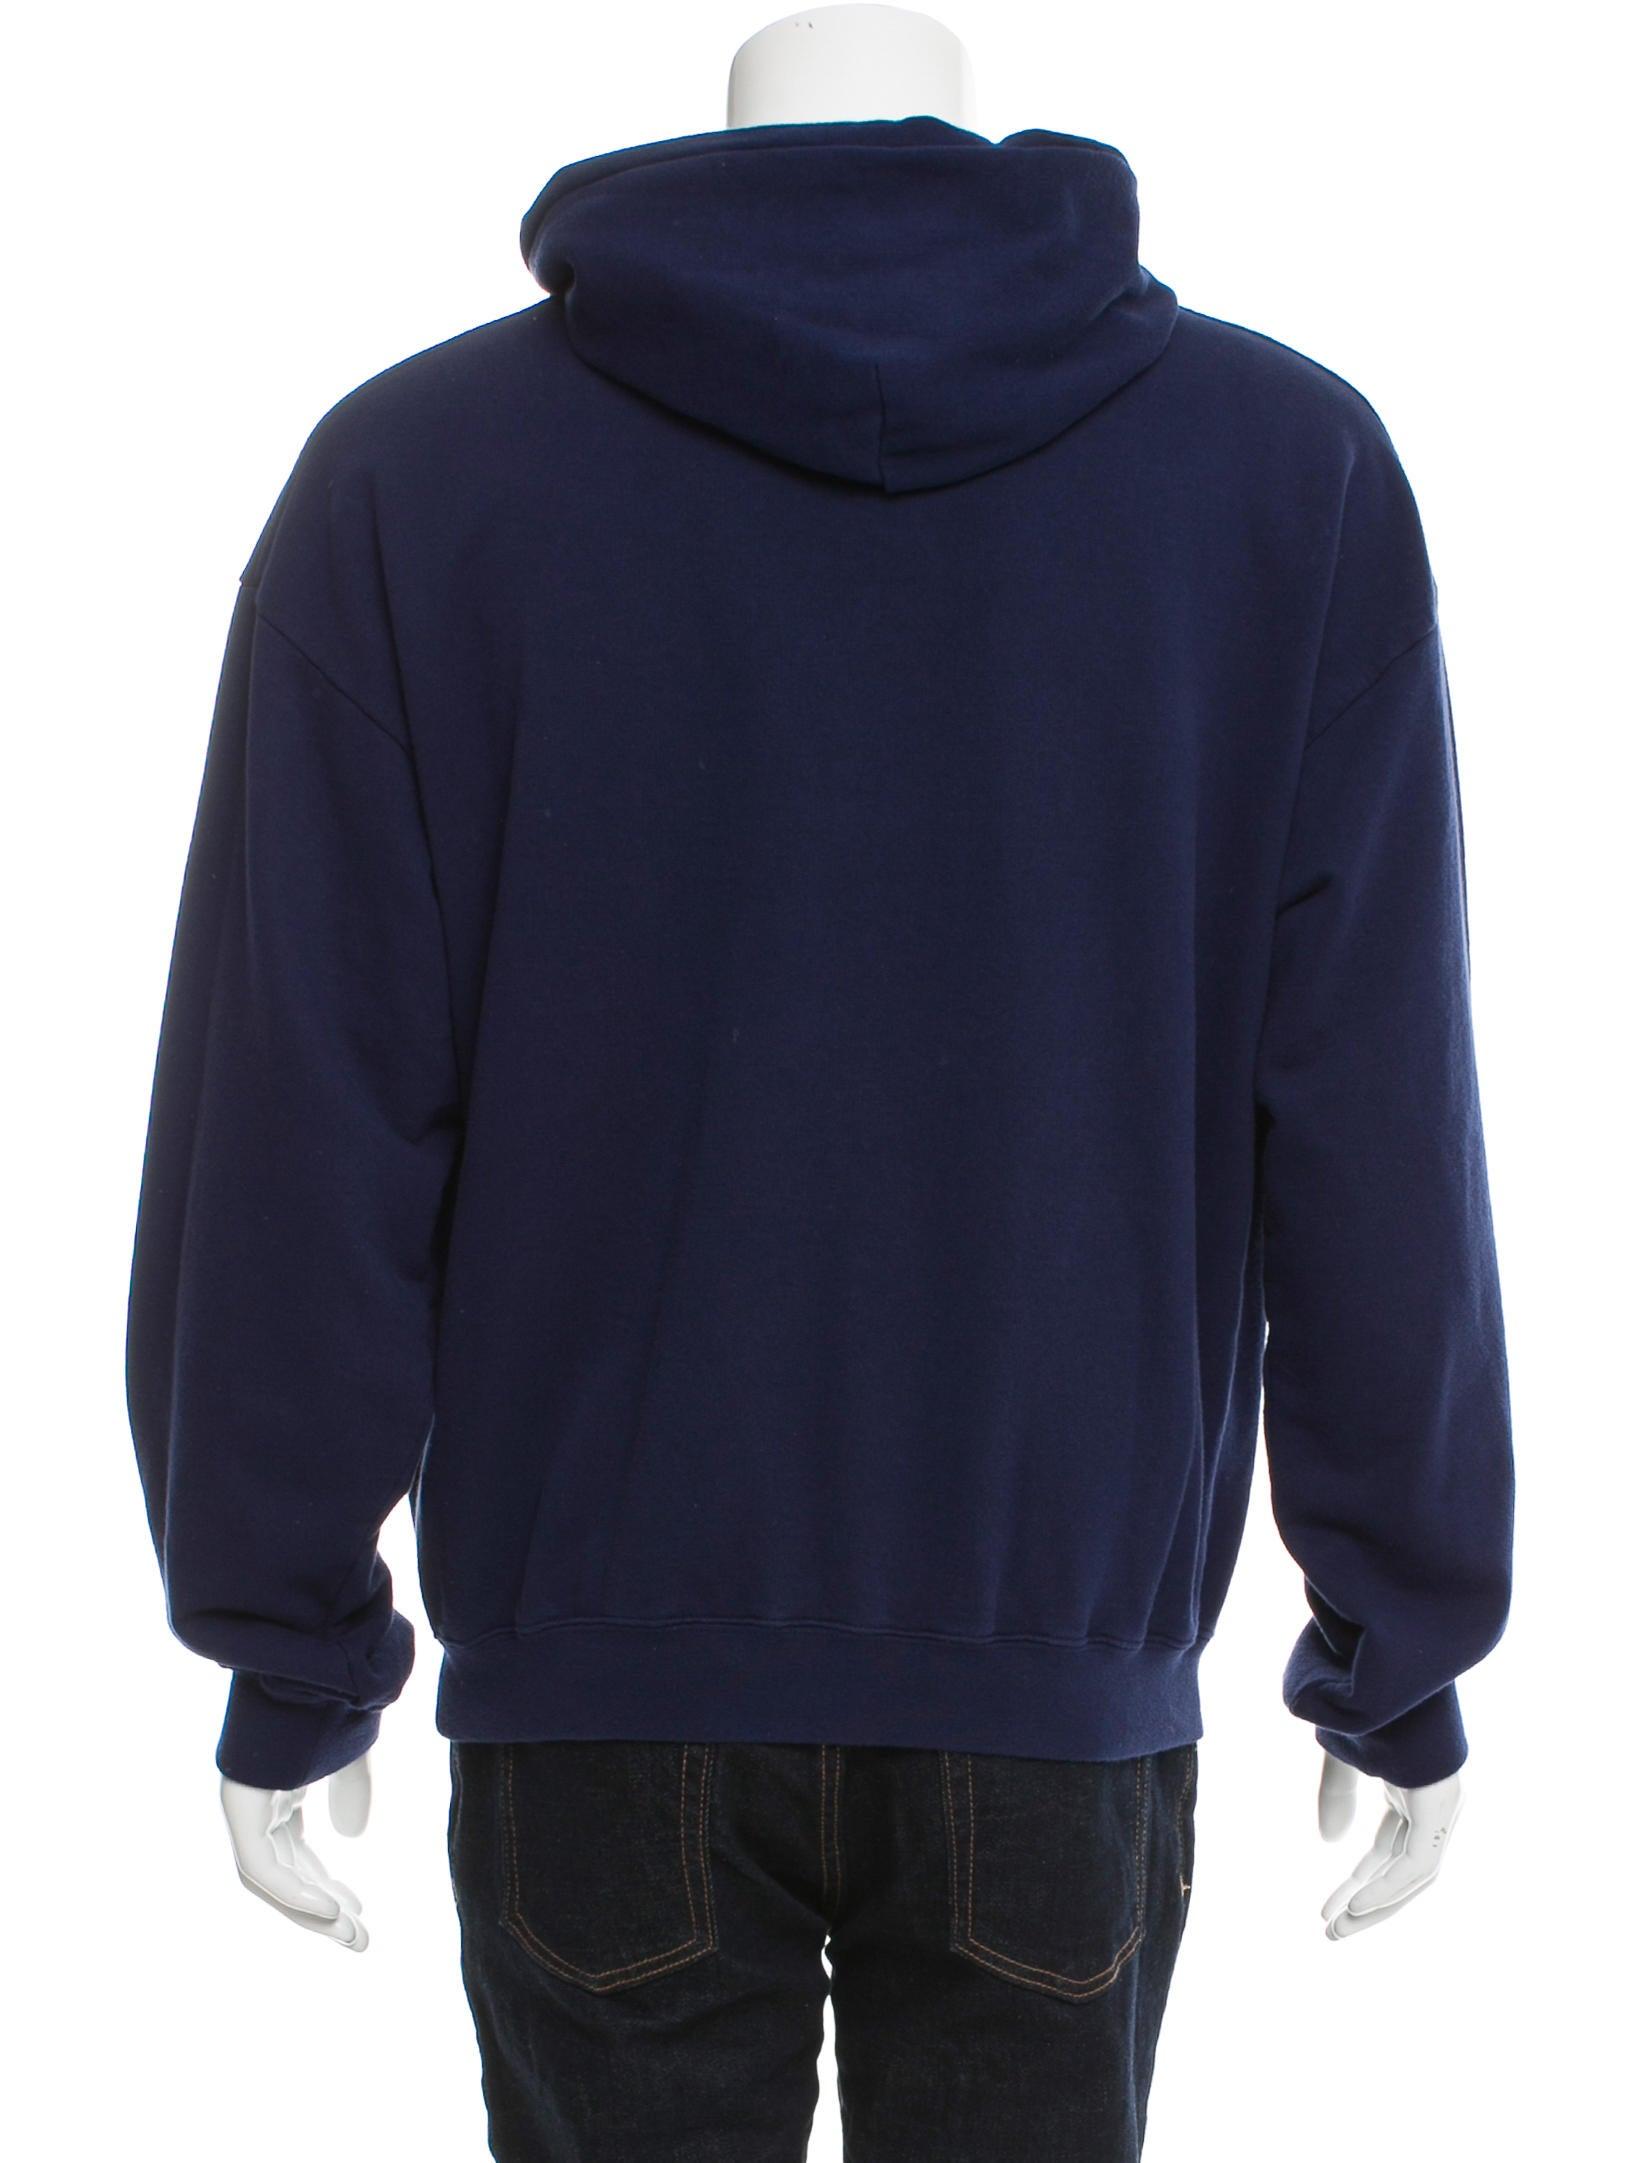 Stoner hoodies